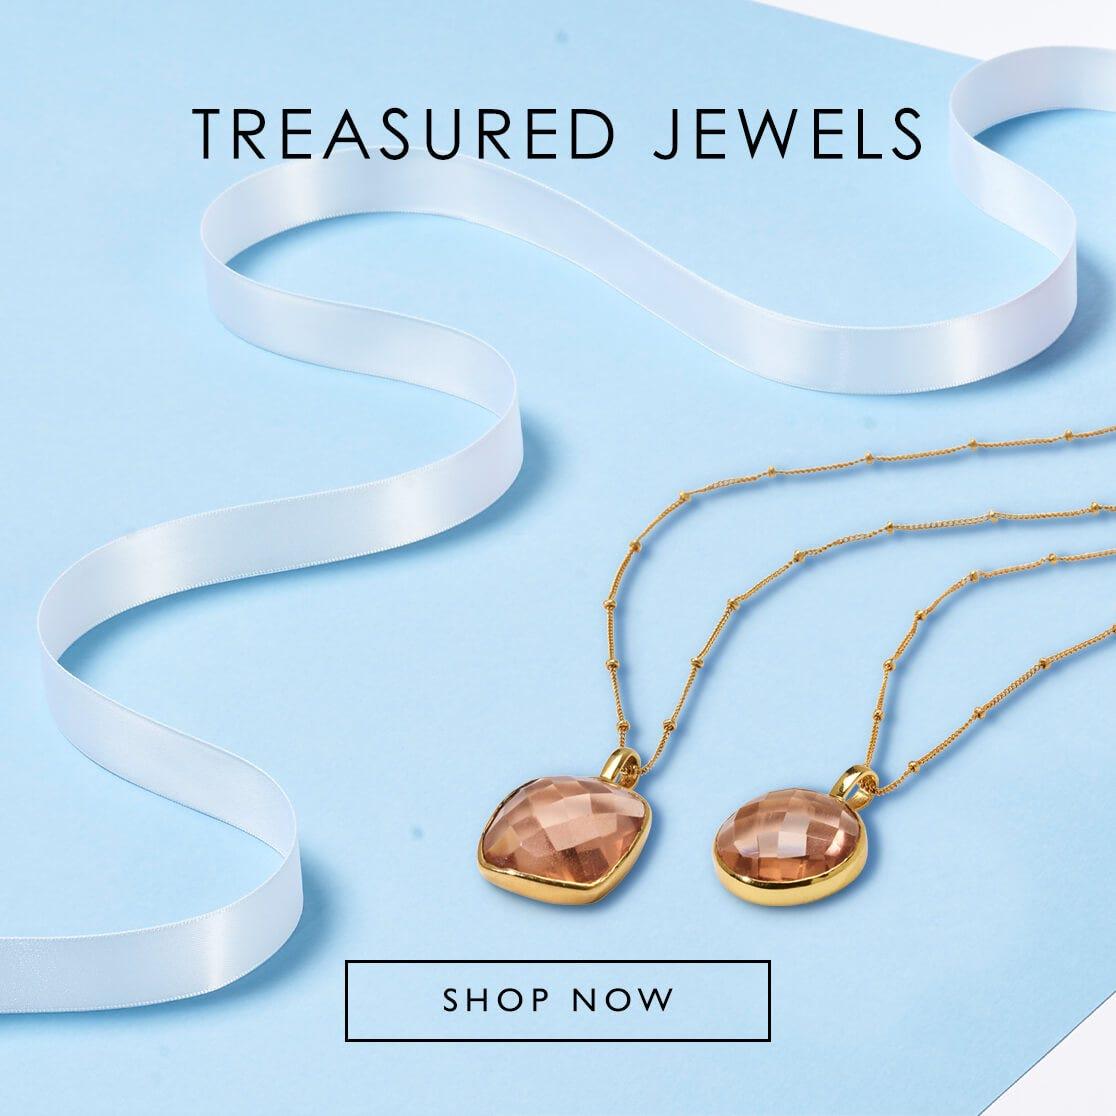 Treasured Jewels